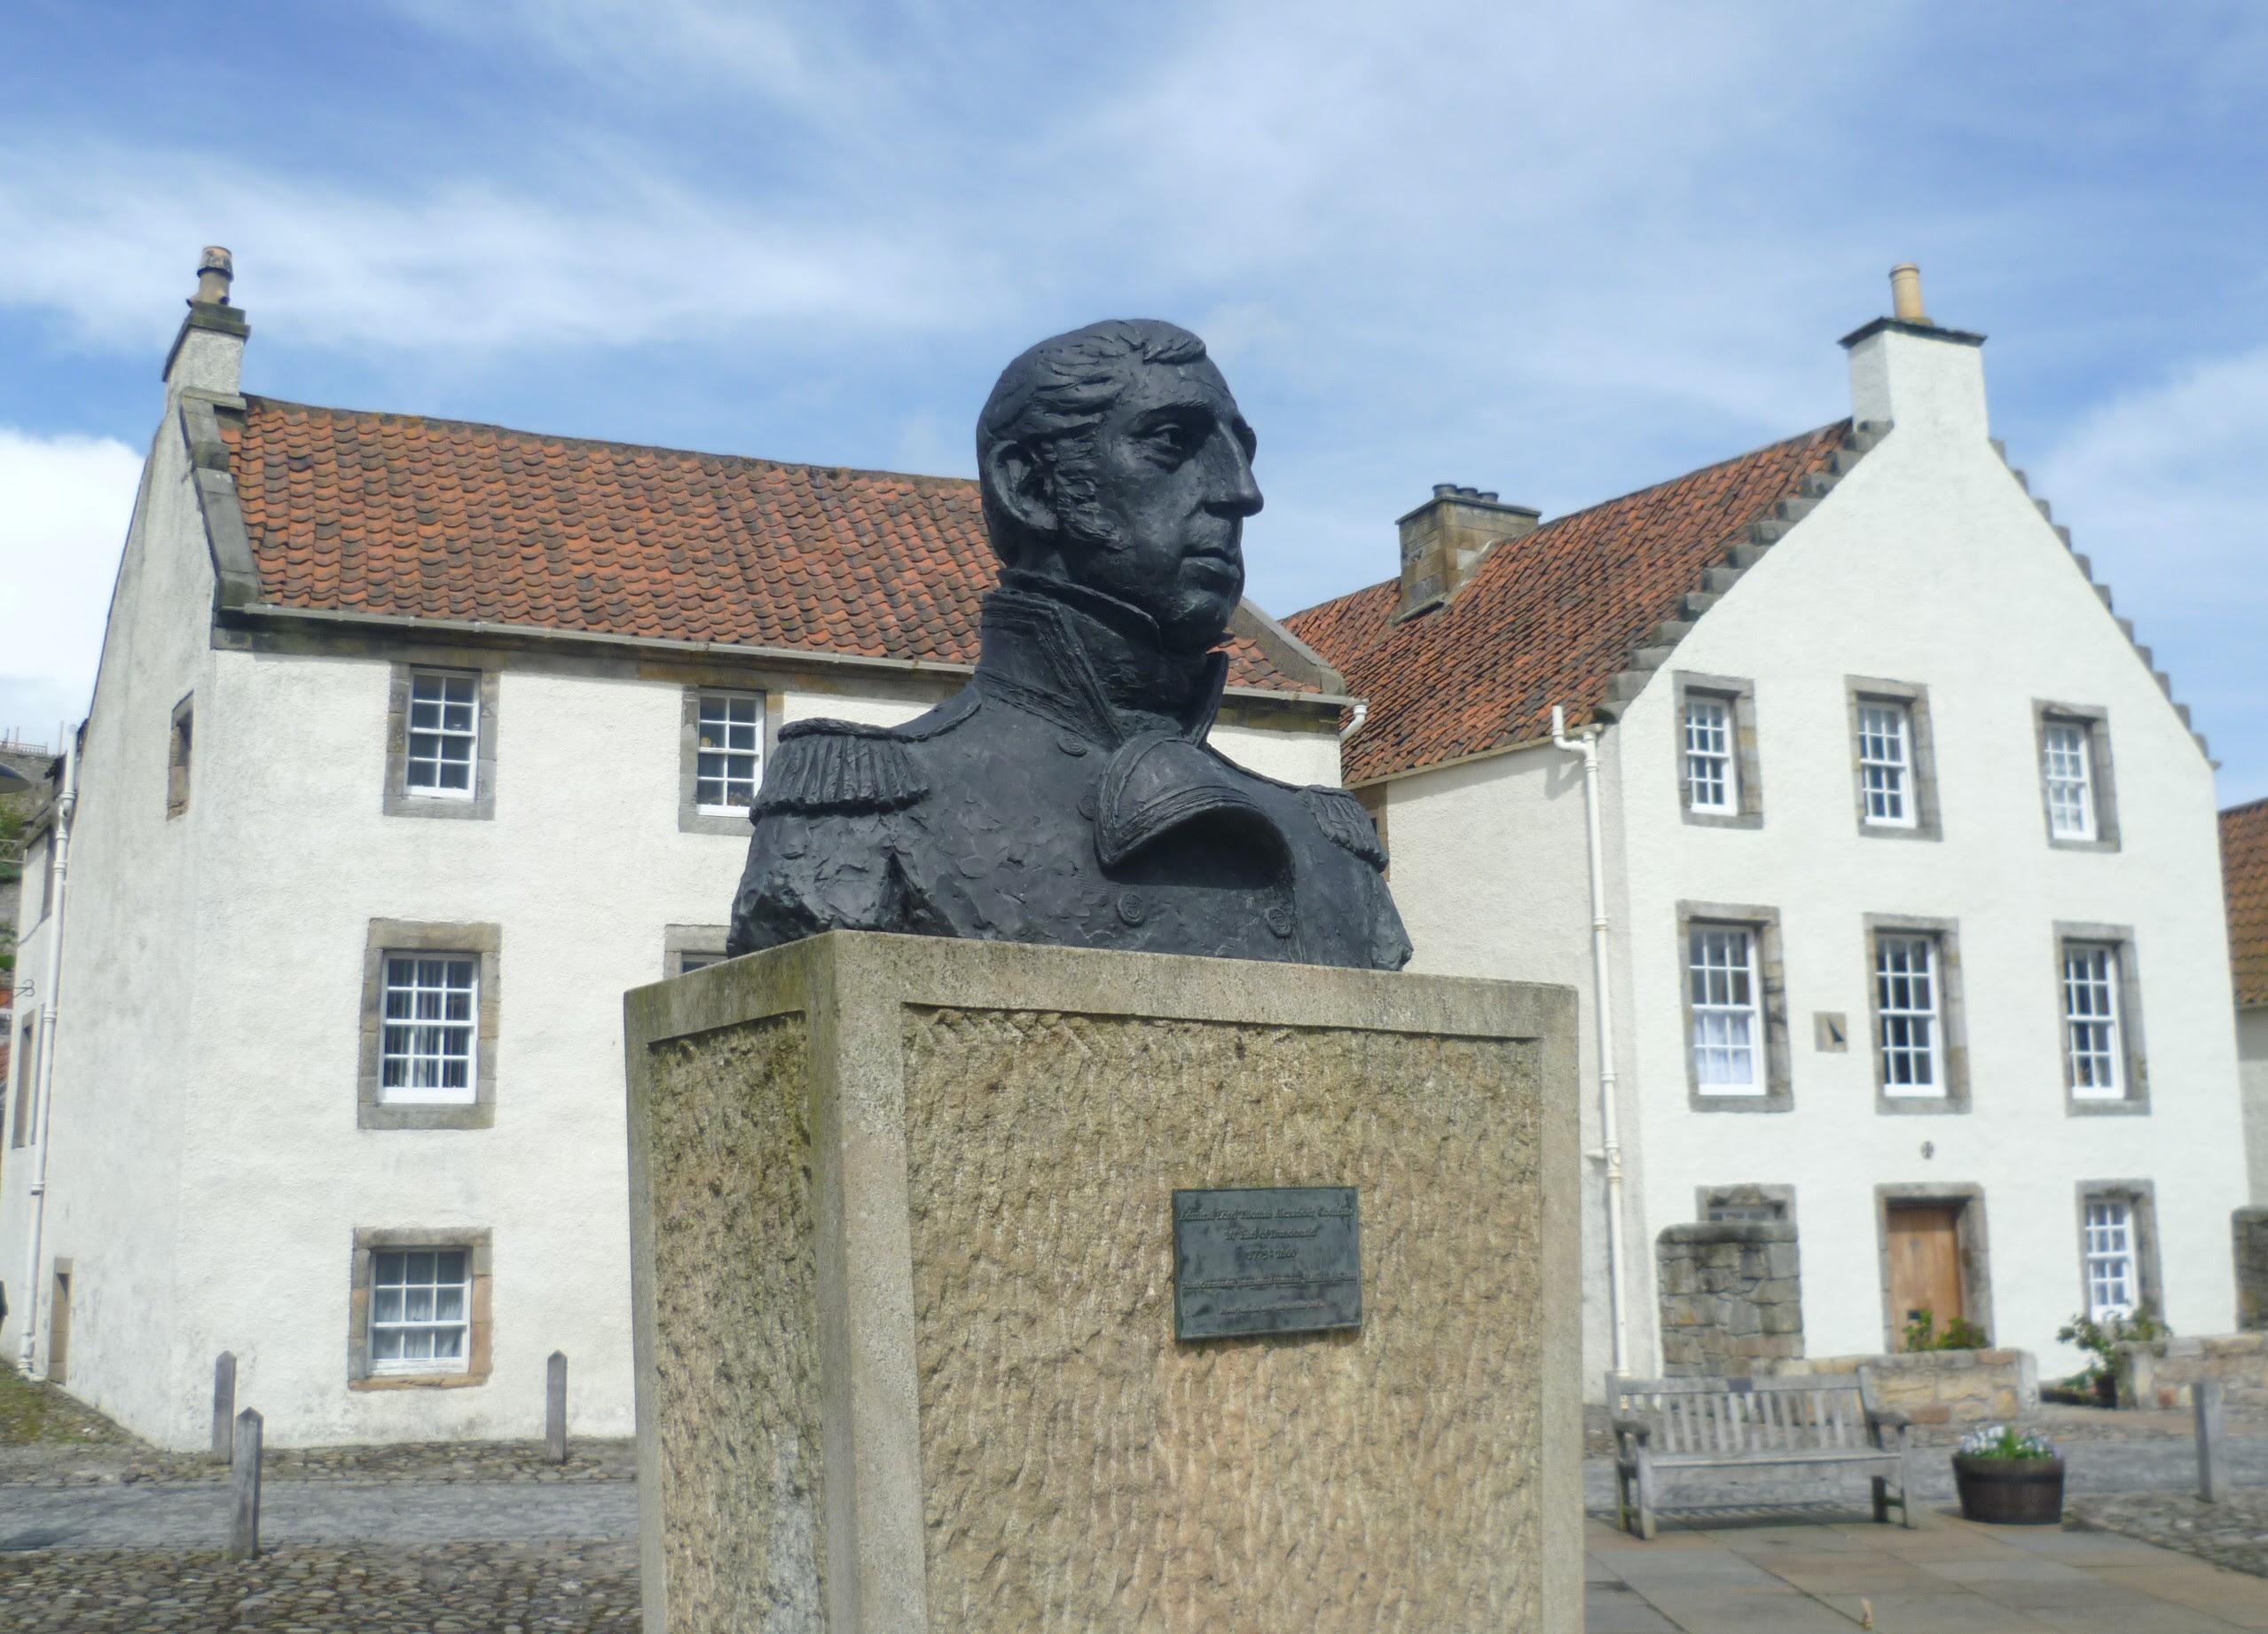 http://upload.wikimedia.org/wikipedia/commons/4/4d/Admiral_Cochrane_bust,_Culross,_Fife.JPG